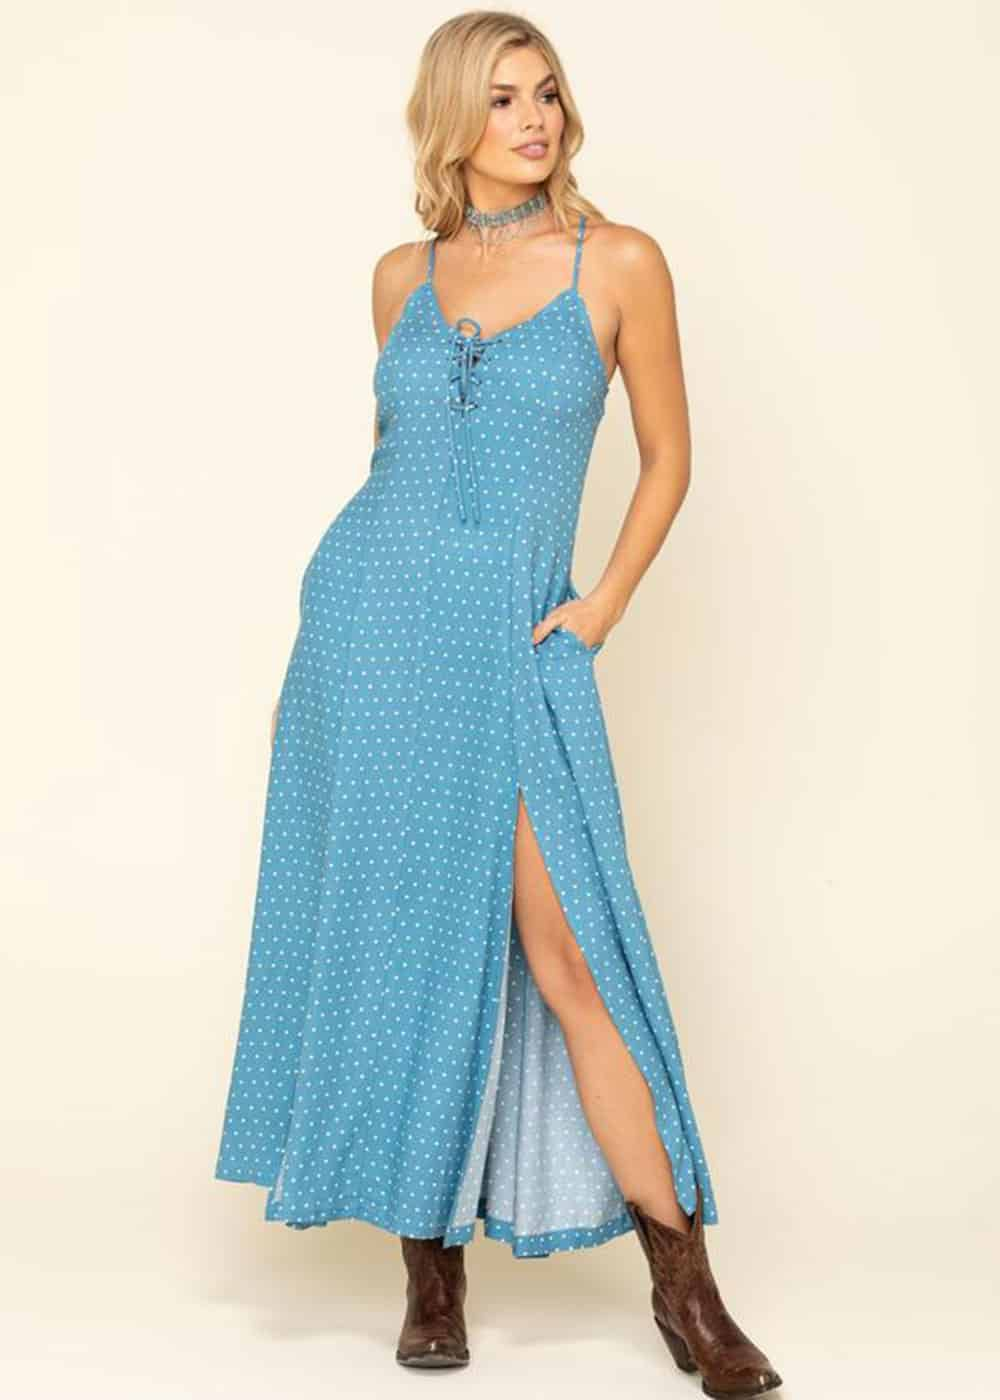 blue dress cowgirl magazine